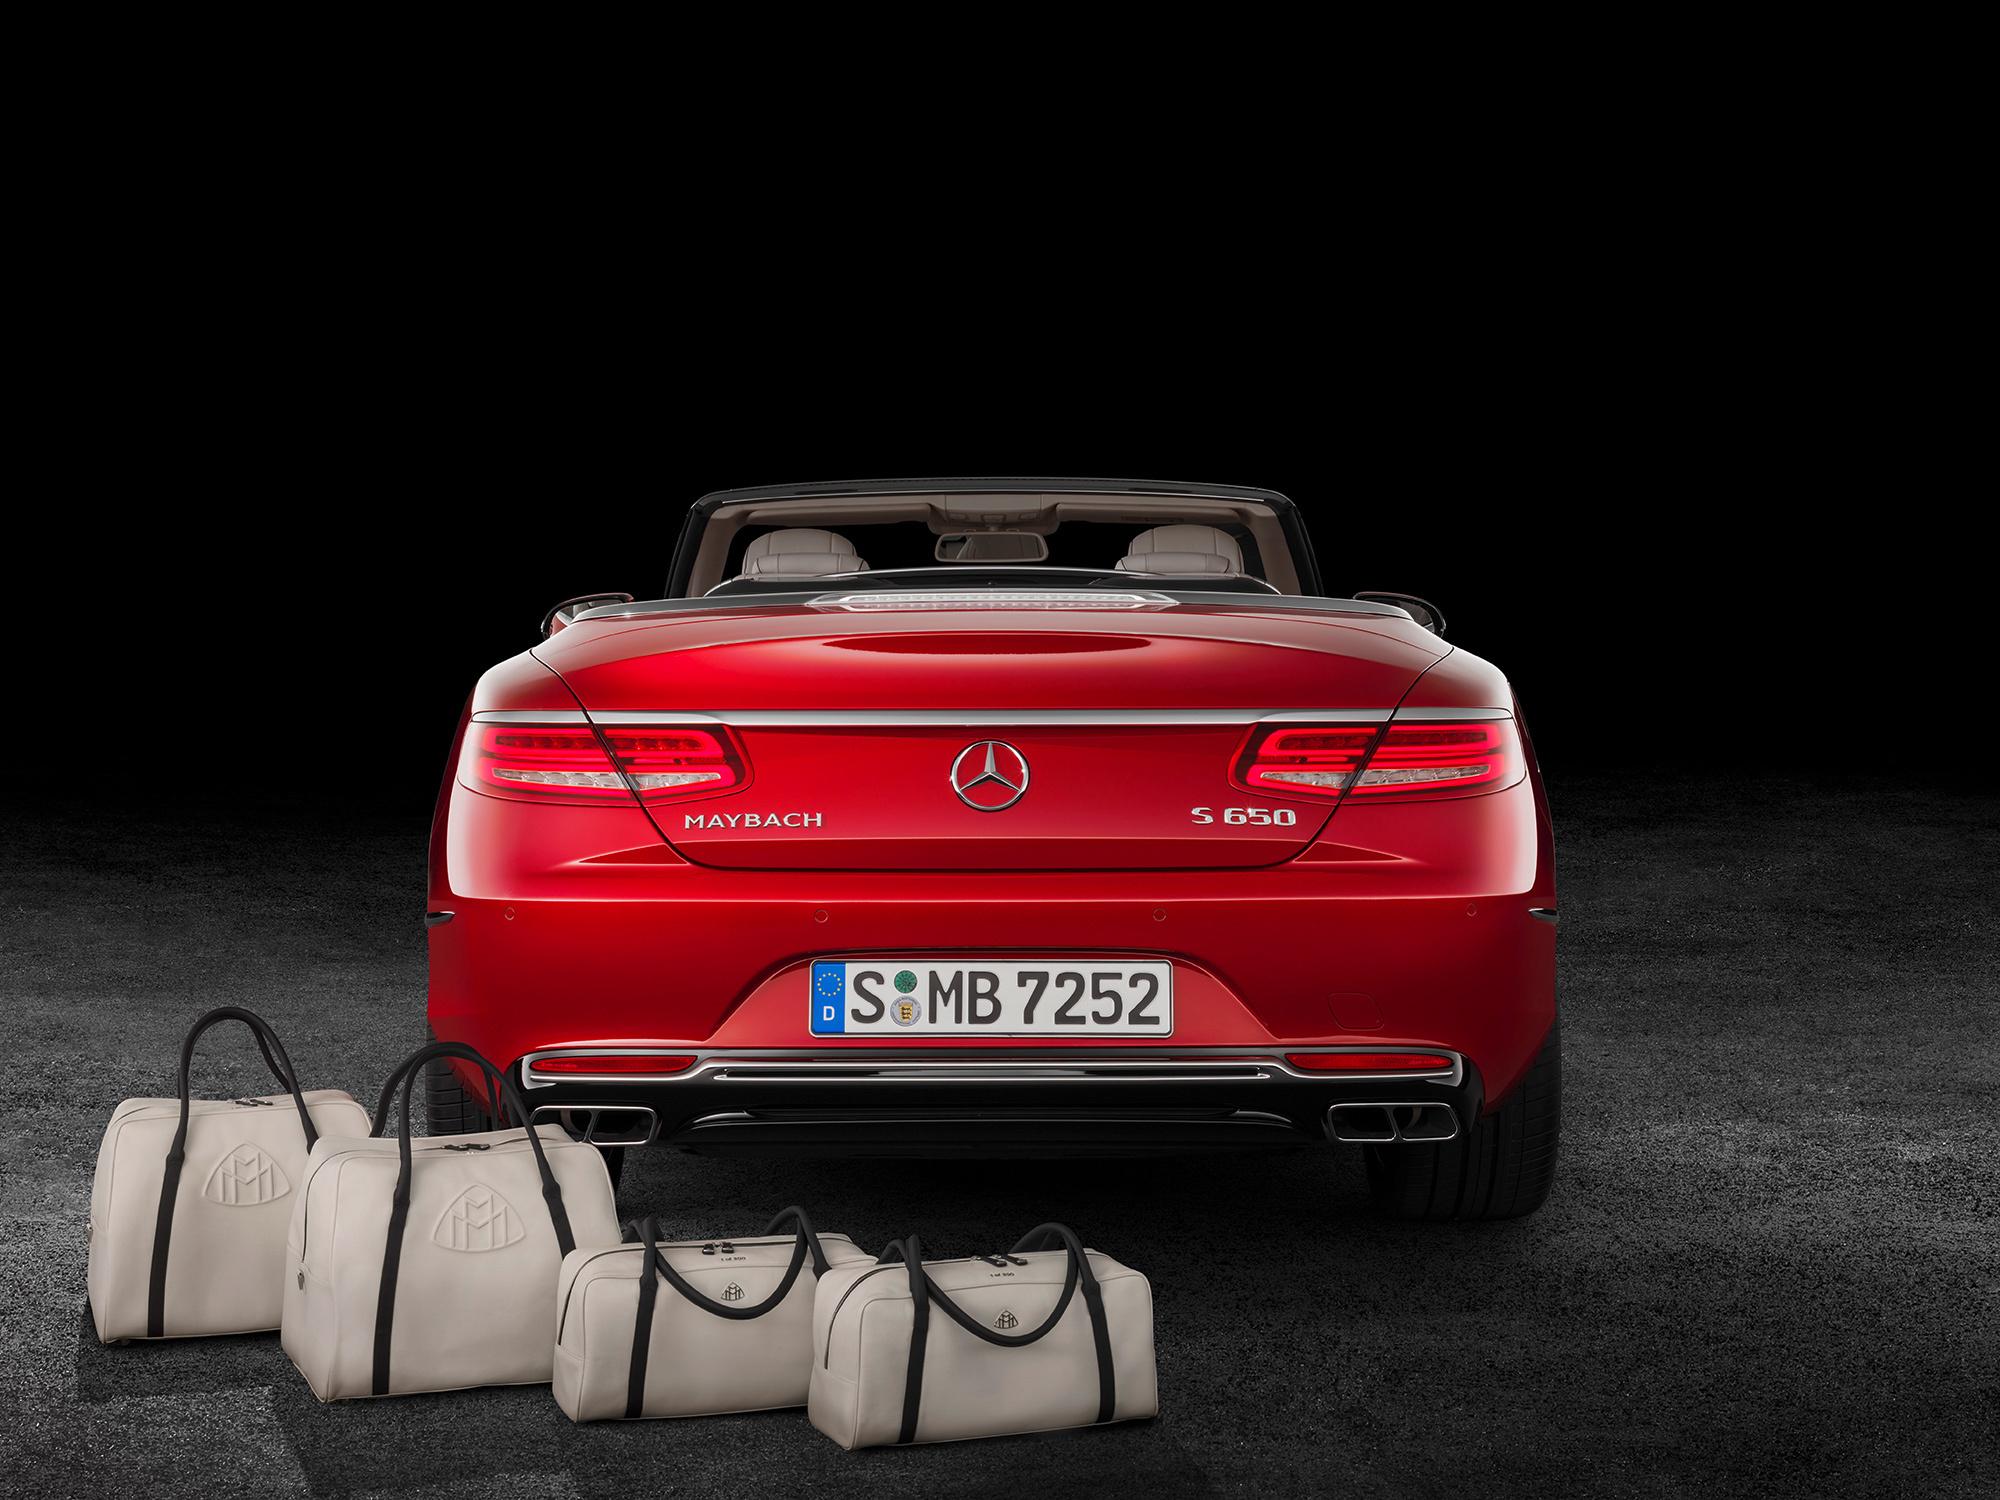 Mercedes Maybach S 650 Wallpaper